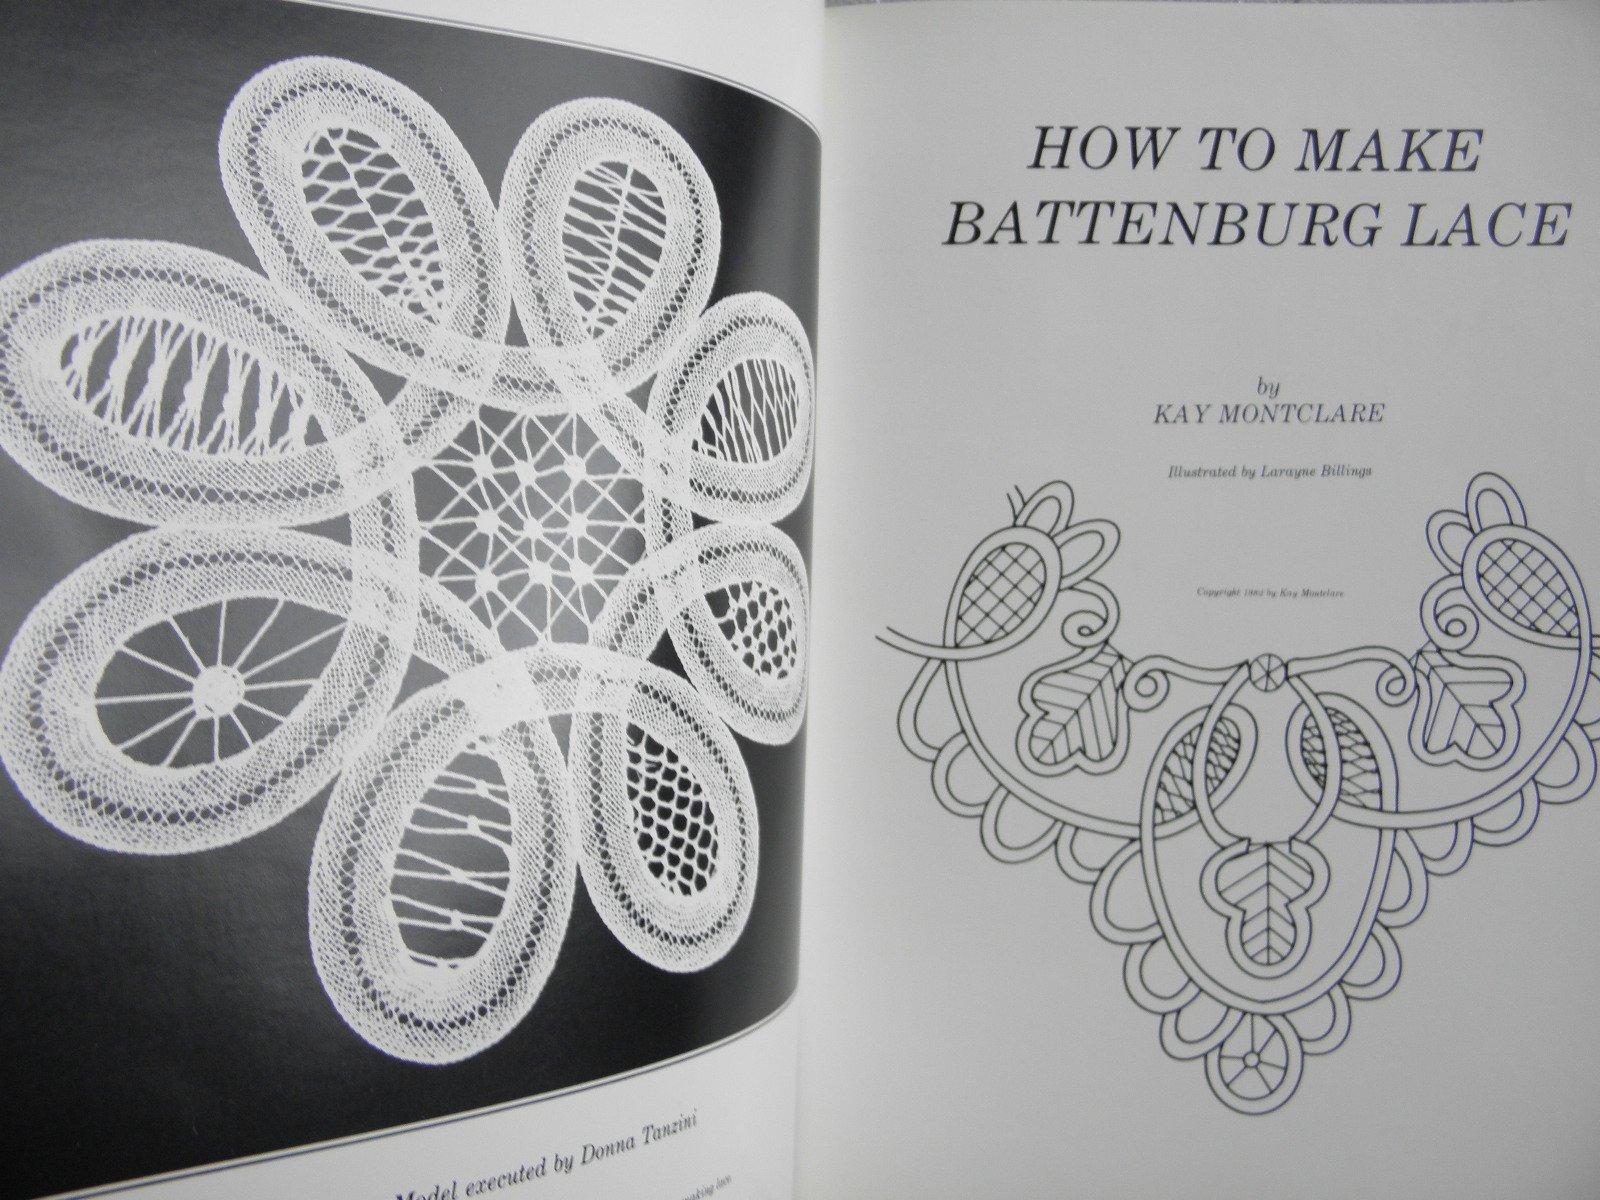 how to make battenburg lace kay montclare amazon com books